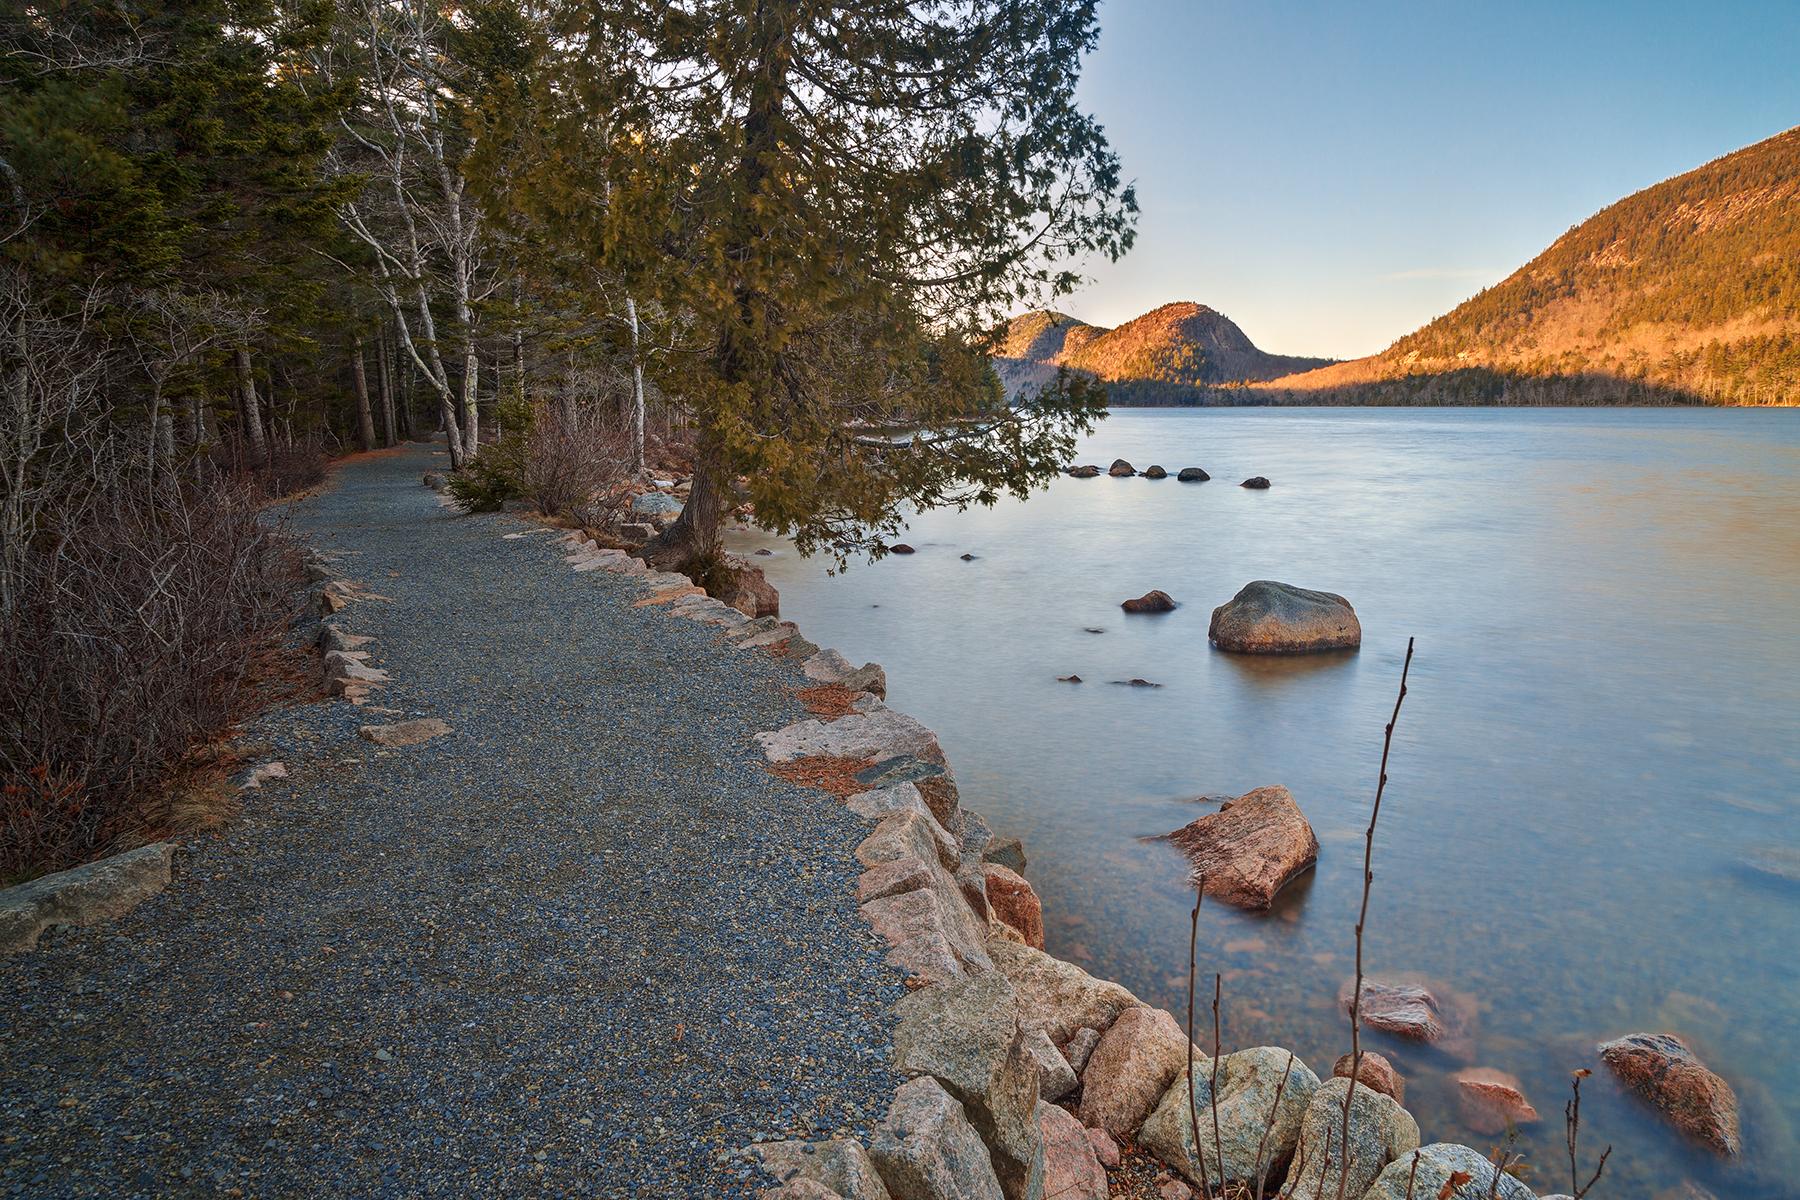 Jordan Pond Trail - HDR, Acadia, Pebble, Scenery, Scene, HQ Photo